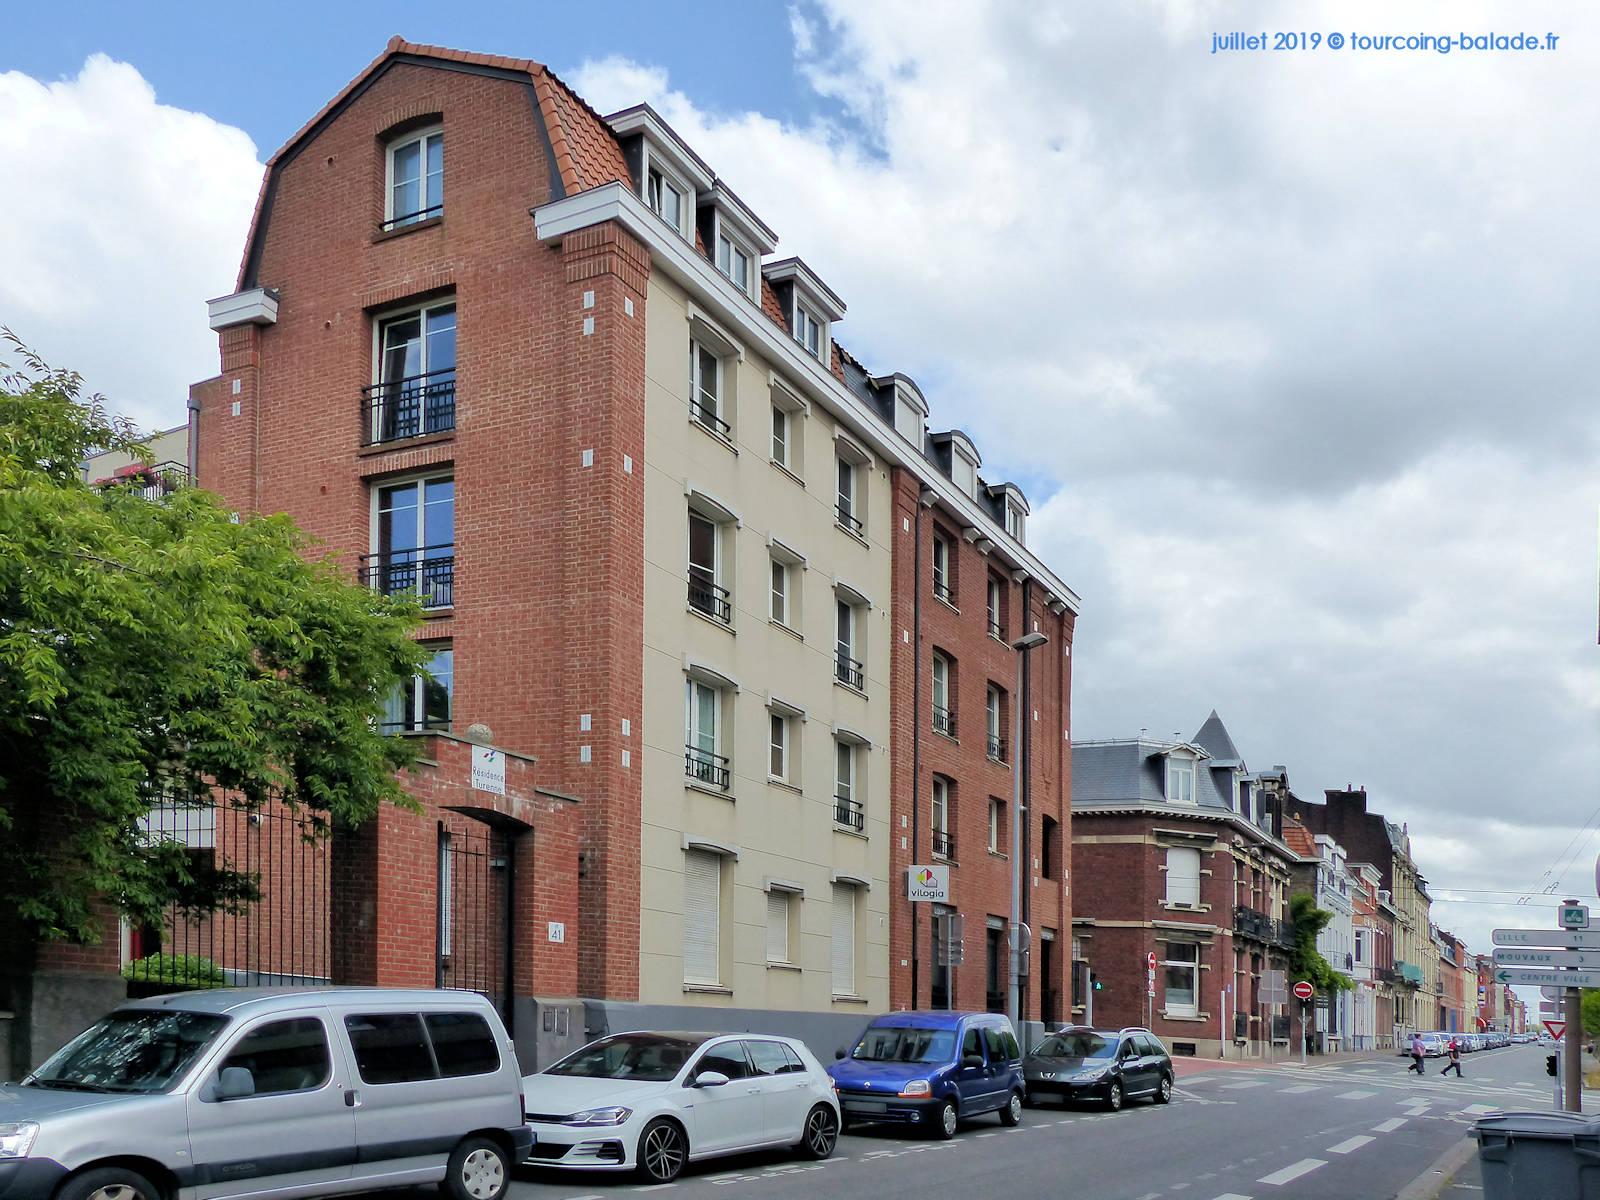 Rue de Turenne, Résidence, Tourcoing 2019